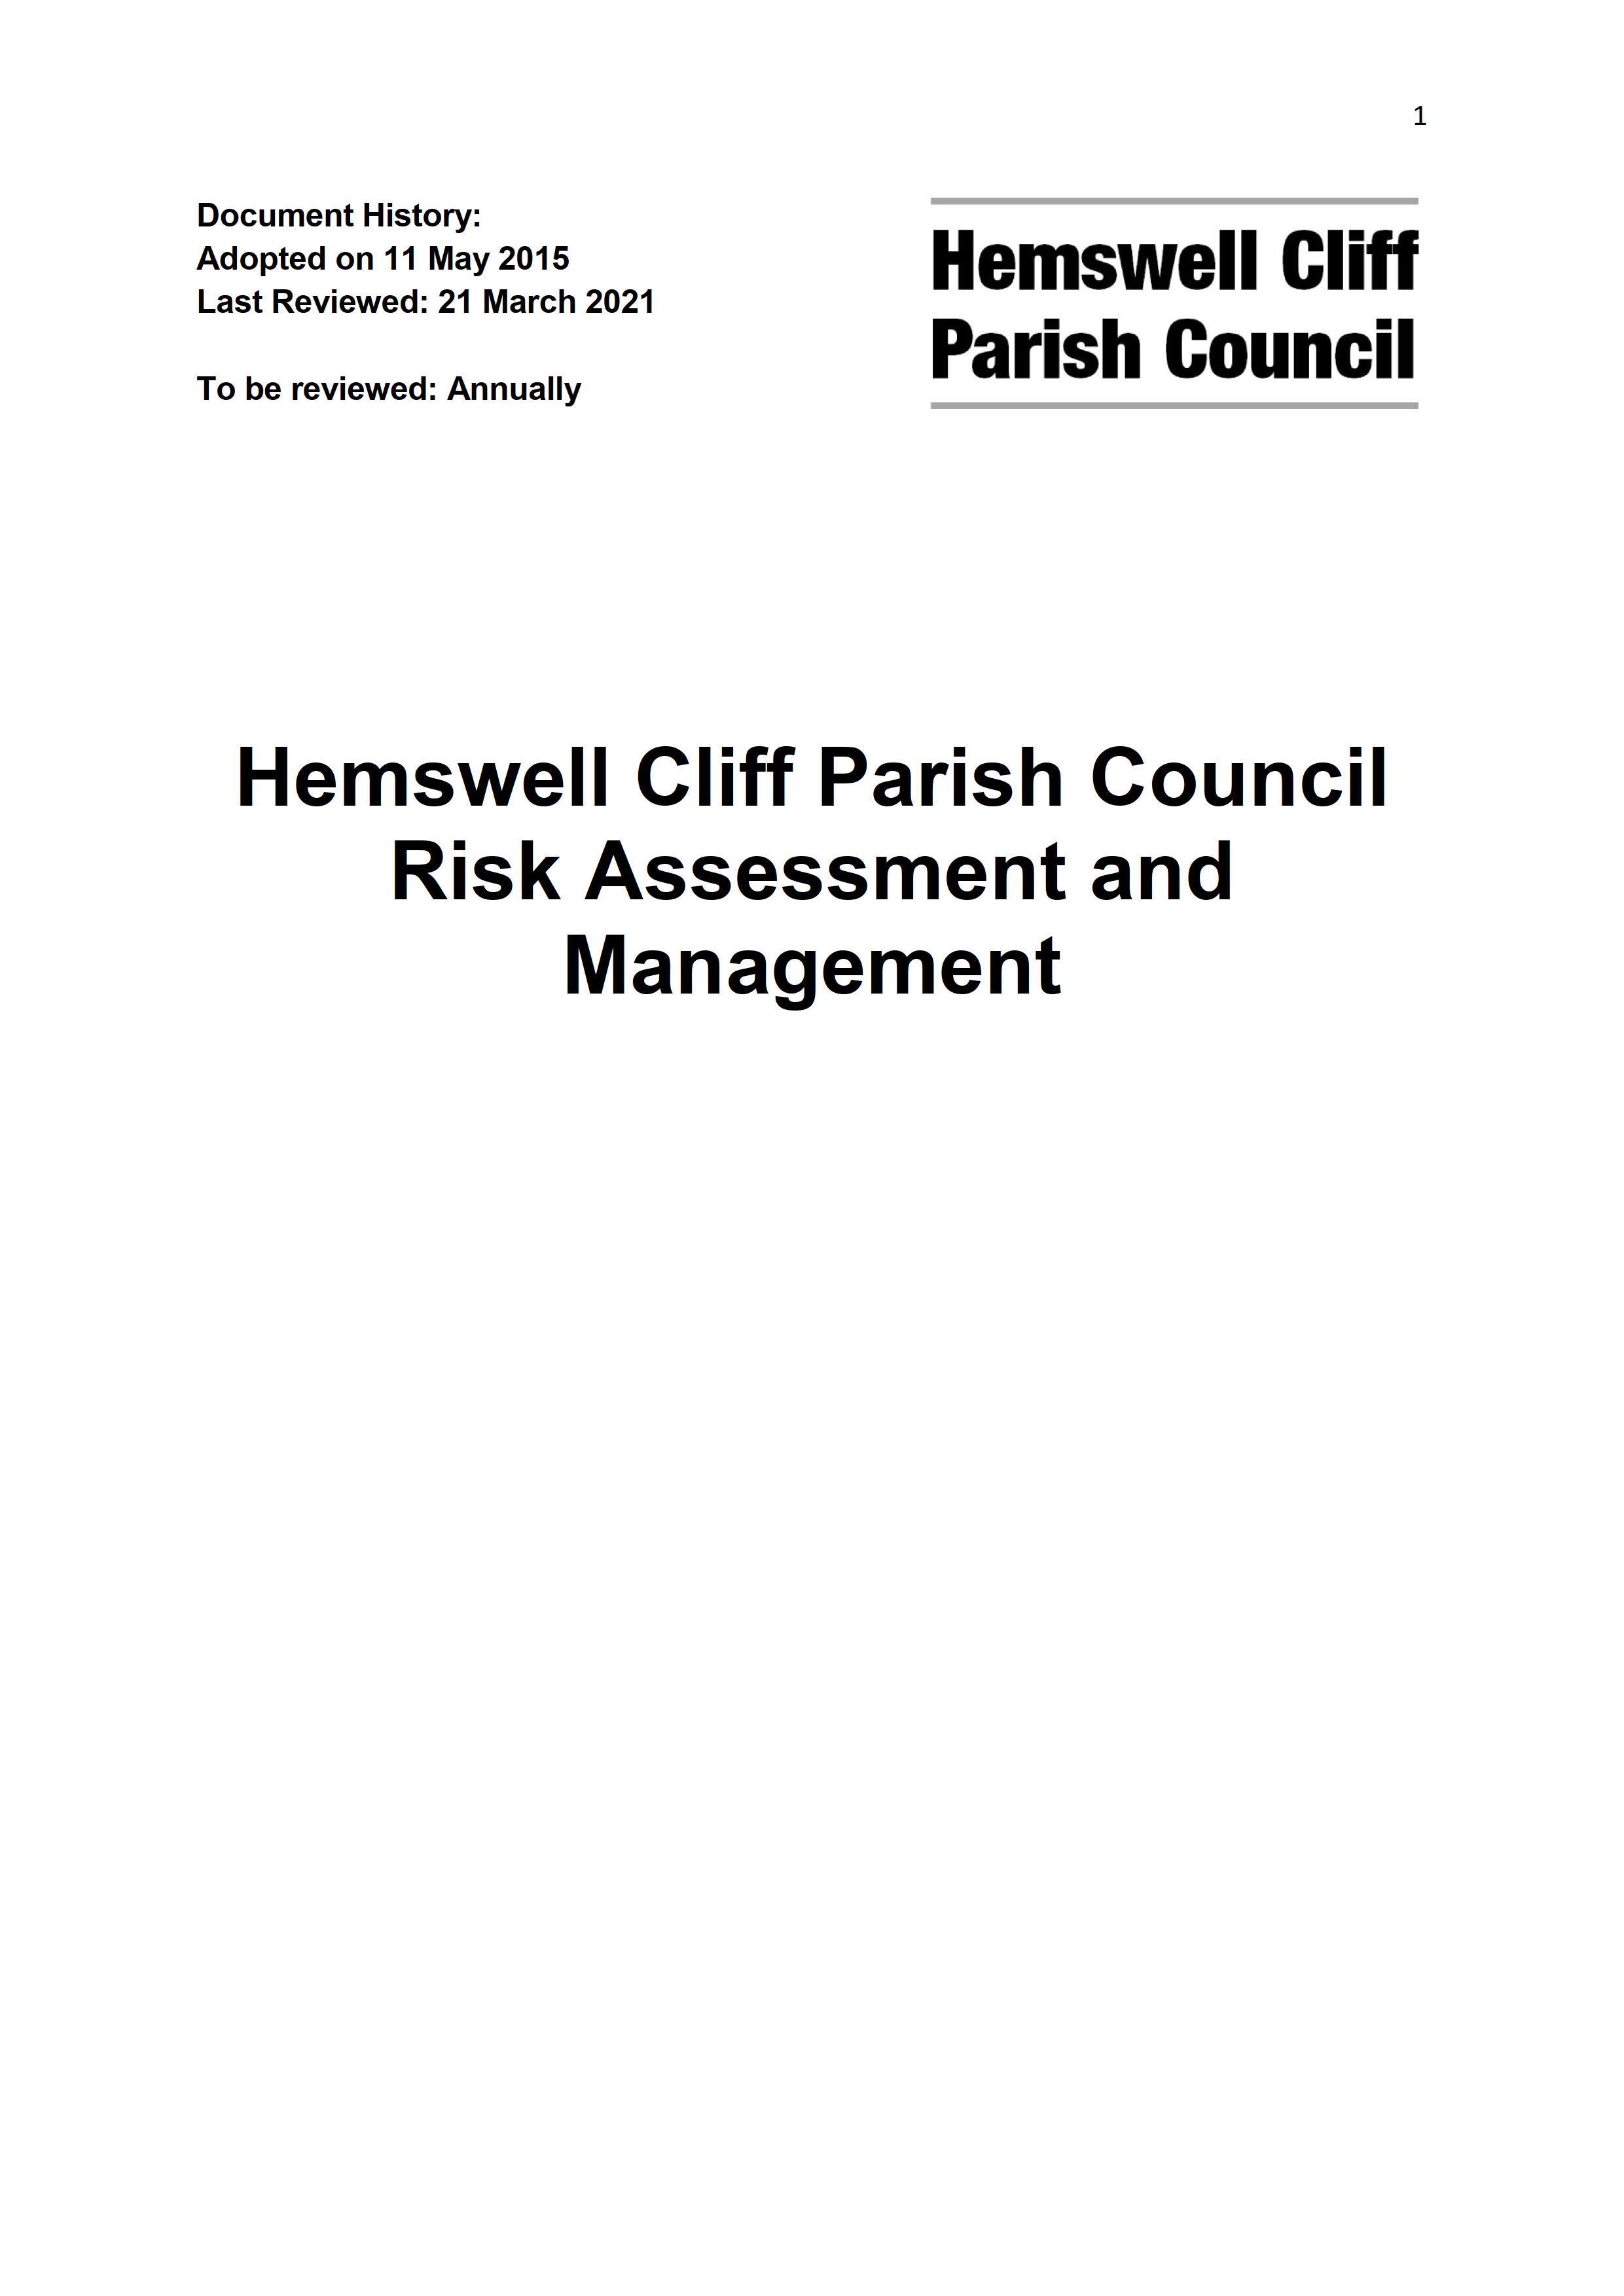 2021HCPC._Risk_Management_1.jpg